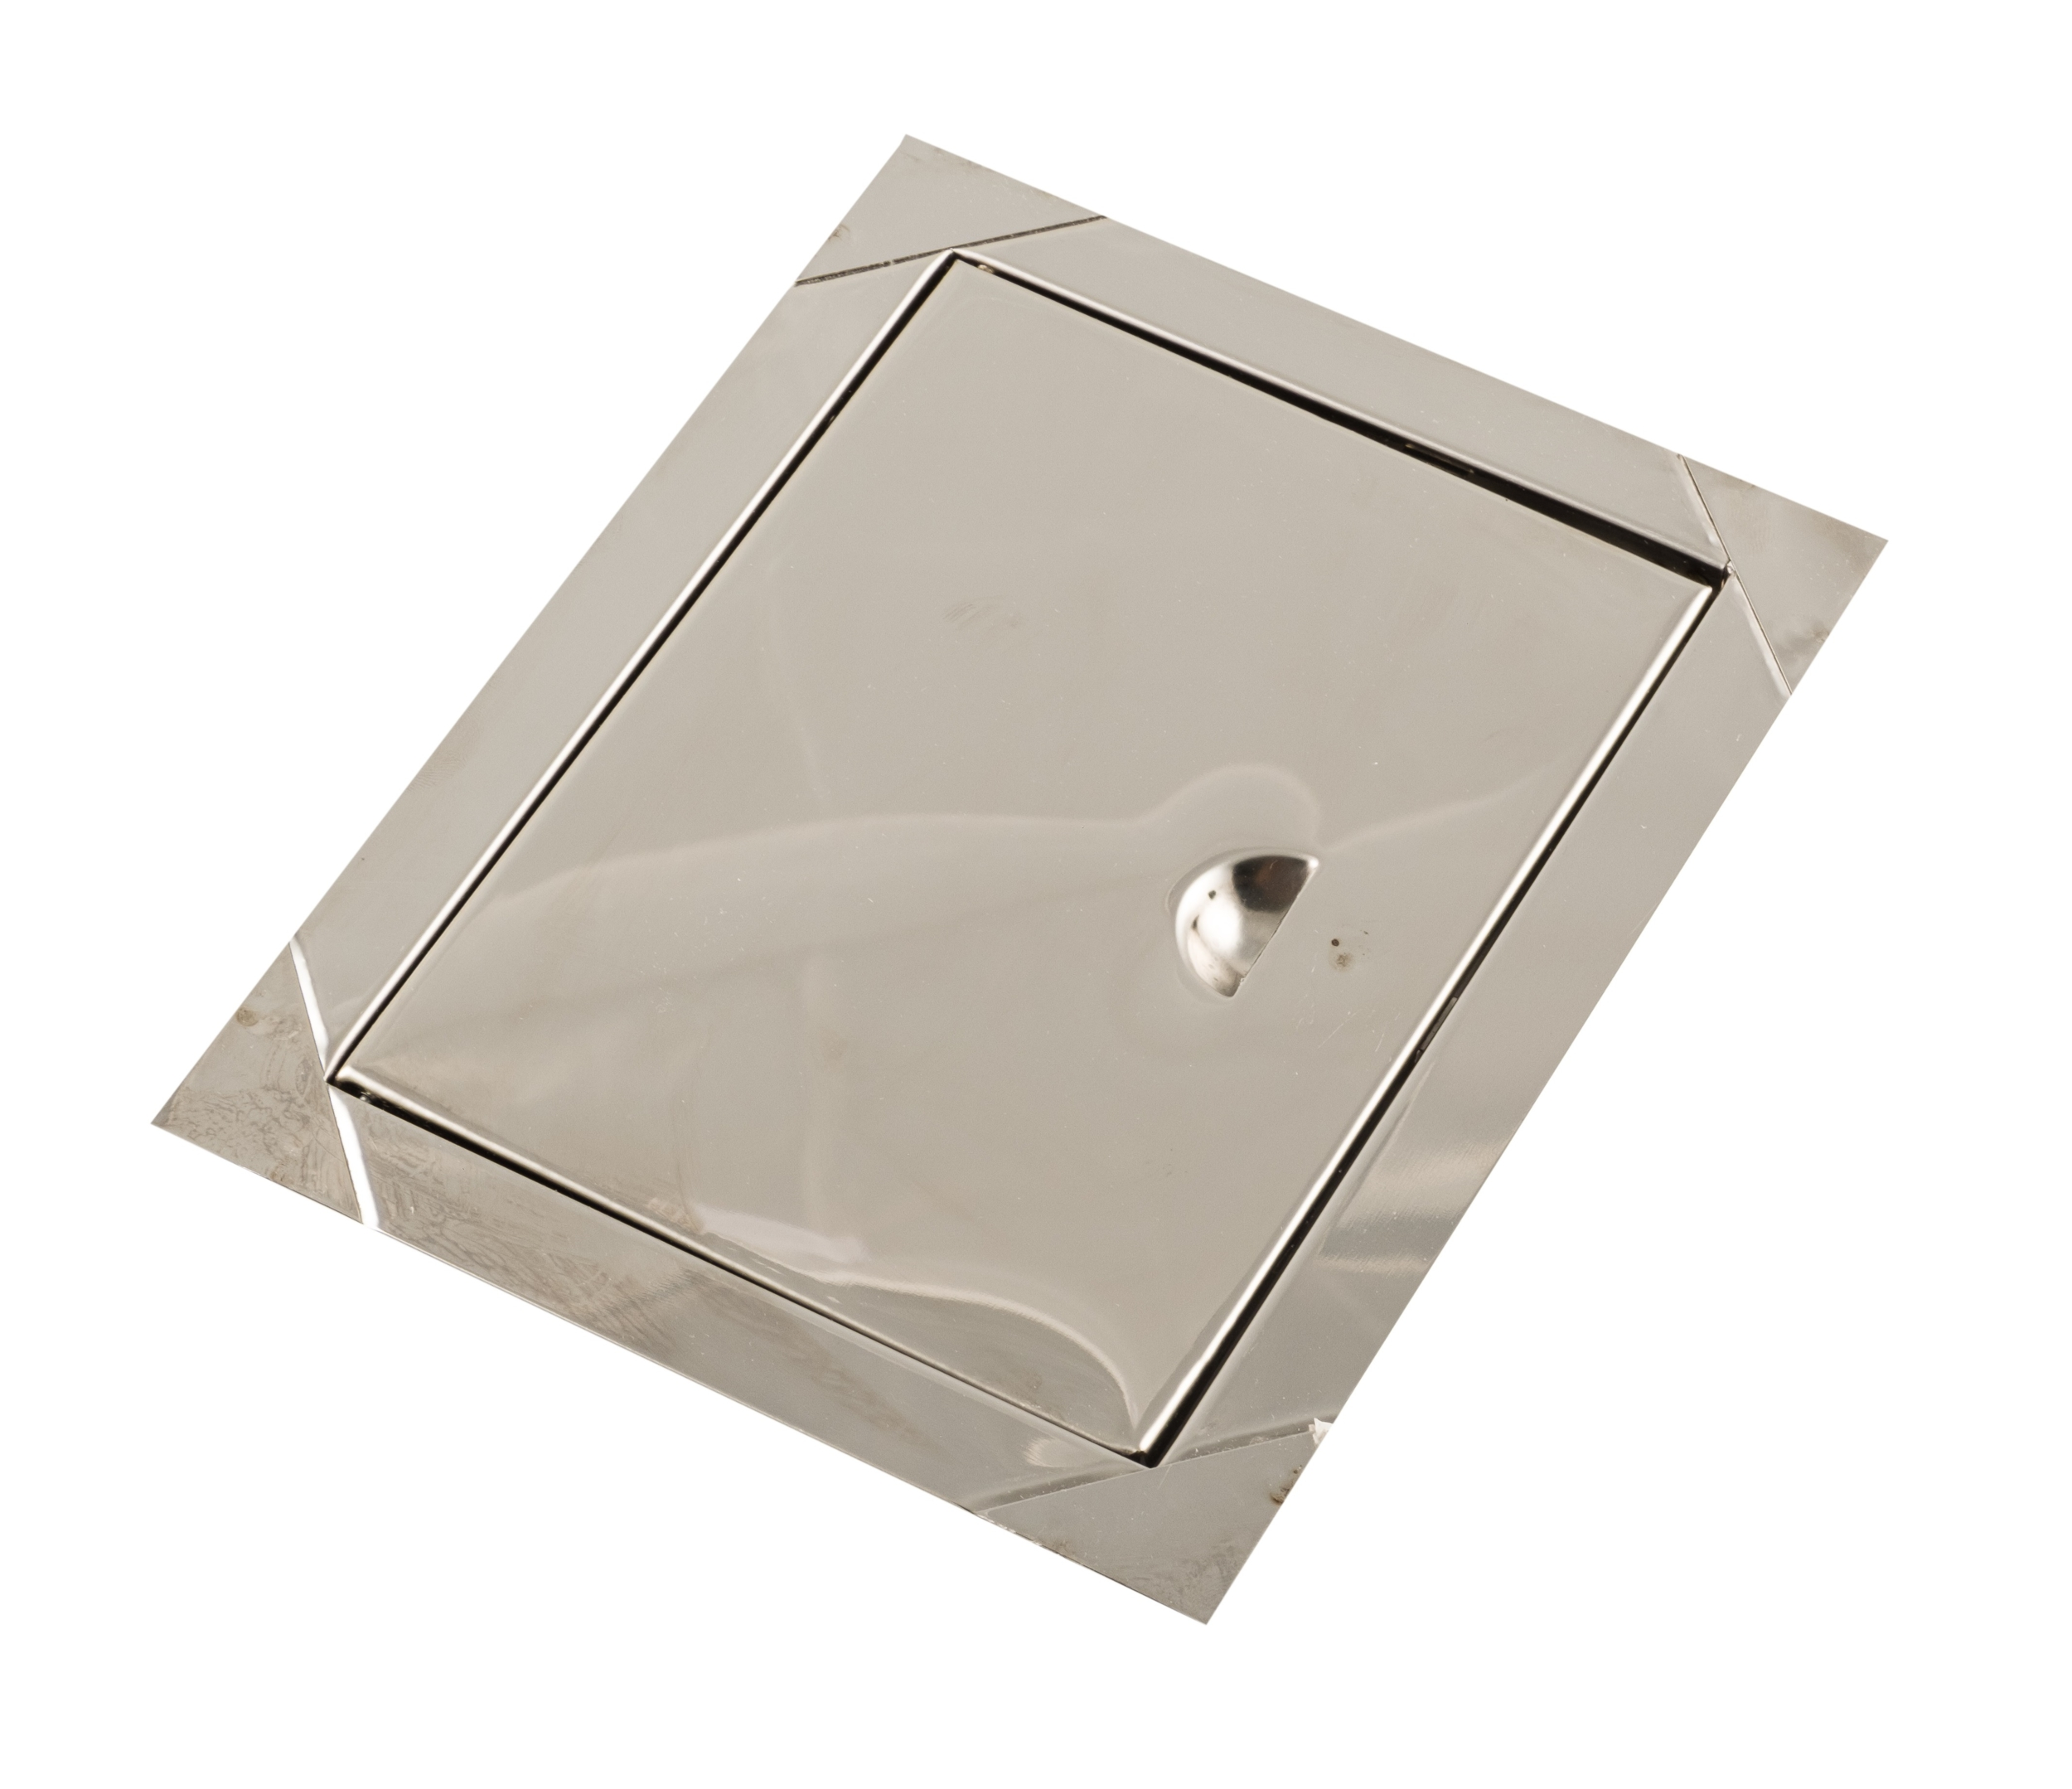 Trappe de visite inox 14,5x19,5cm